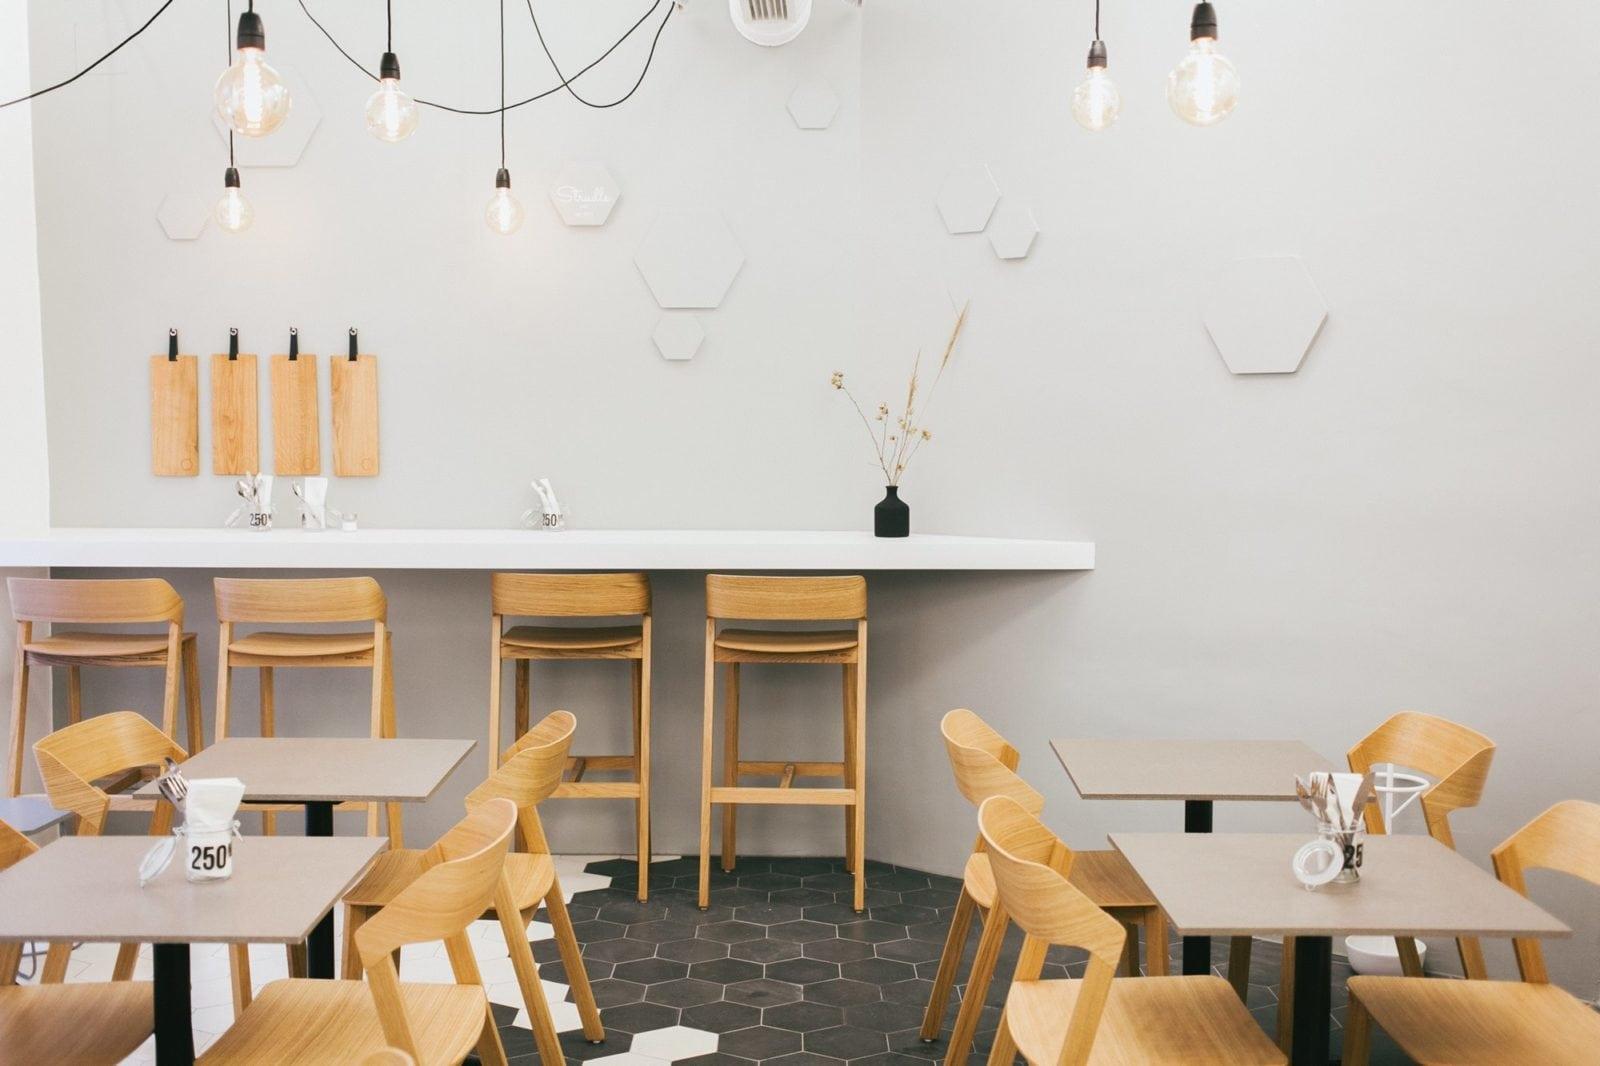 TON Merano Bar Stools and Chairs at Strudls Restaurant